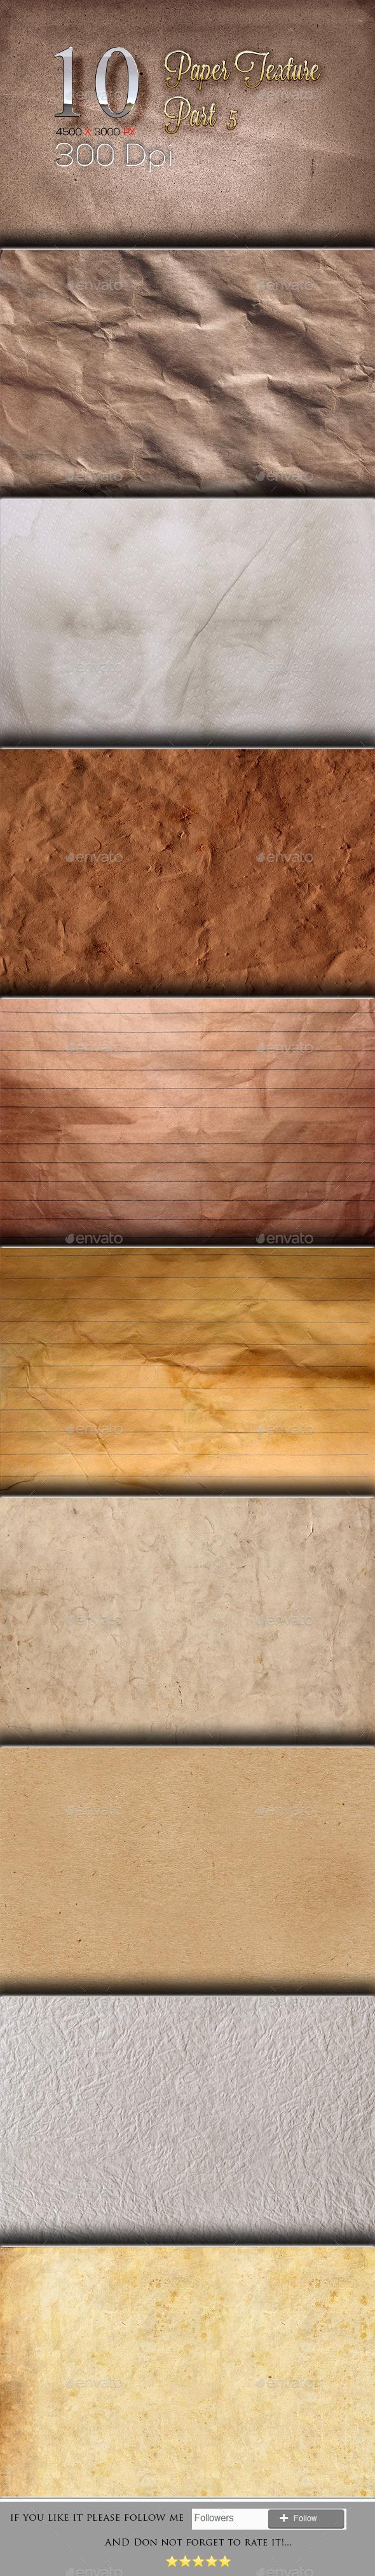 10 Paper Texture Part 5 - Textures